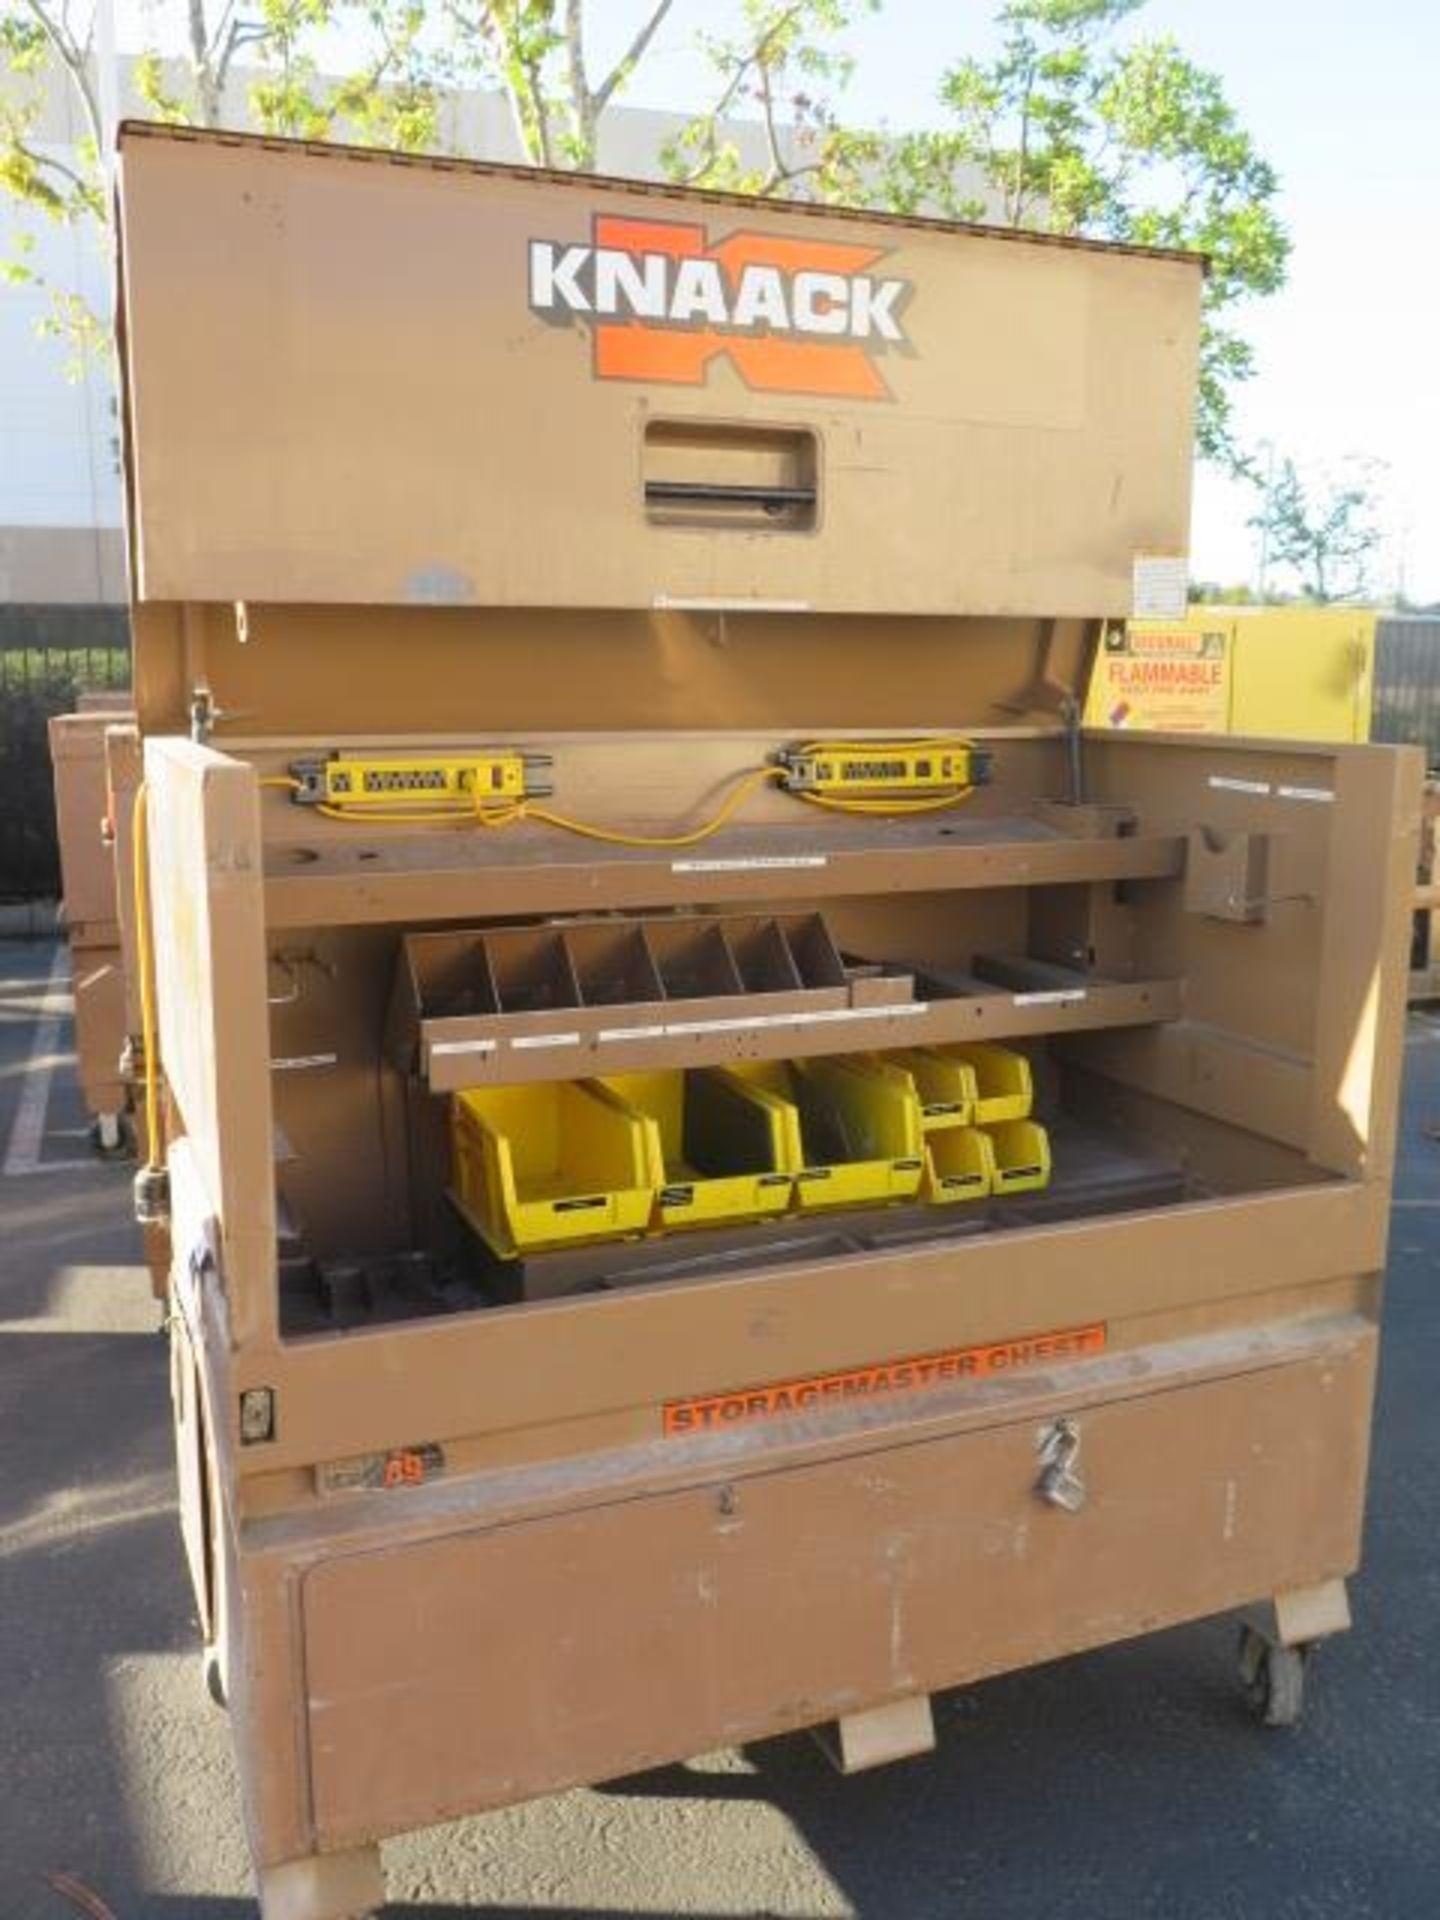 Knaack mdl. 89 Storagemaster Rolling Job Box (SOLD AS-IS - NO WARRANTY) - Image 4 of 12